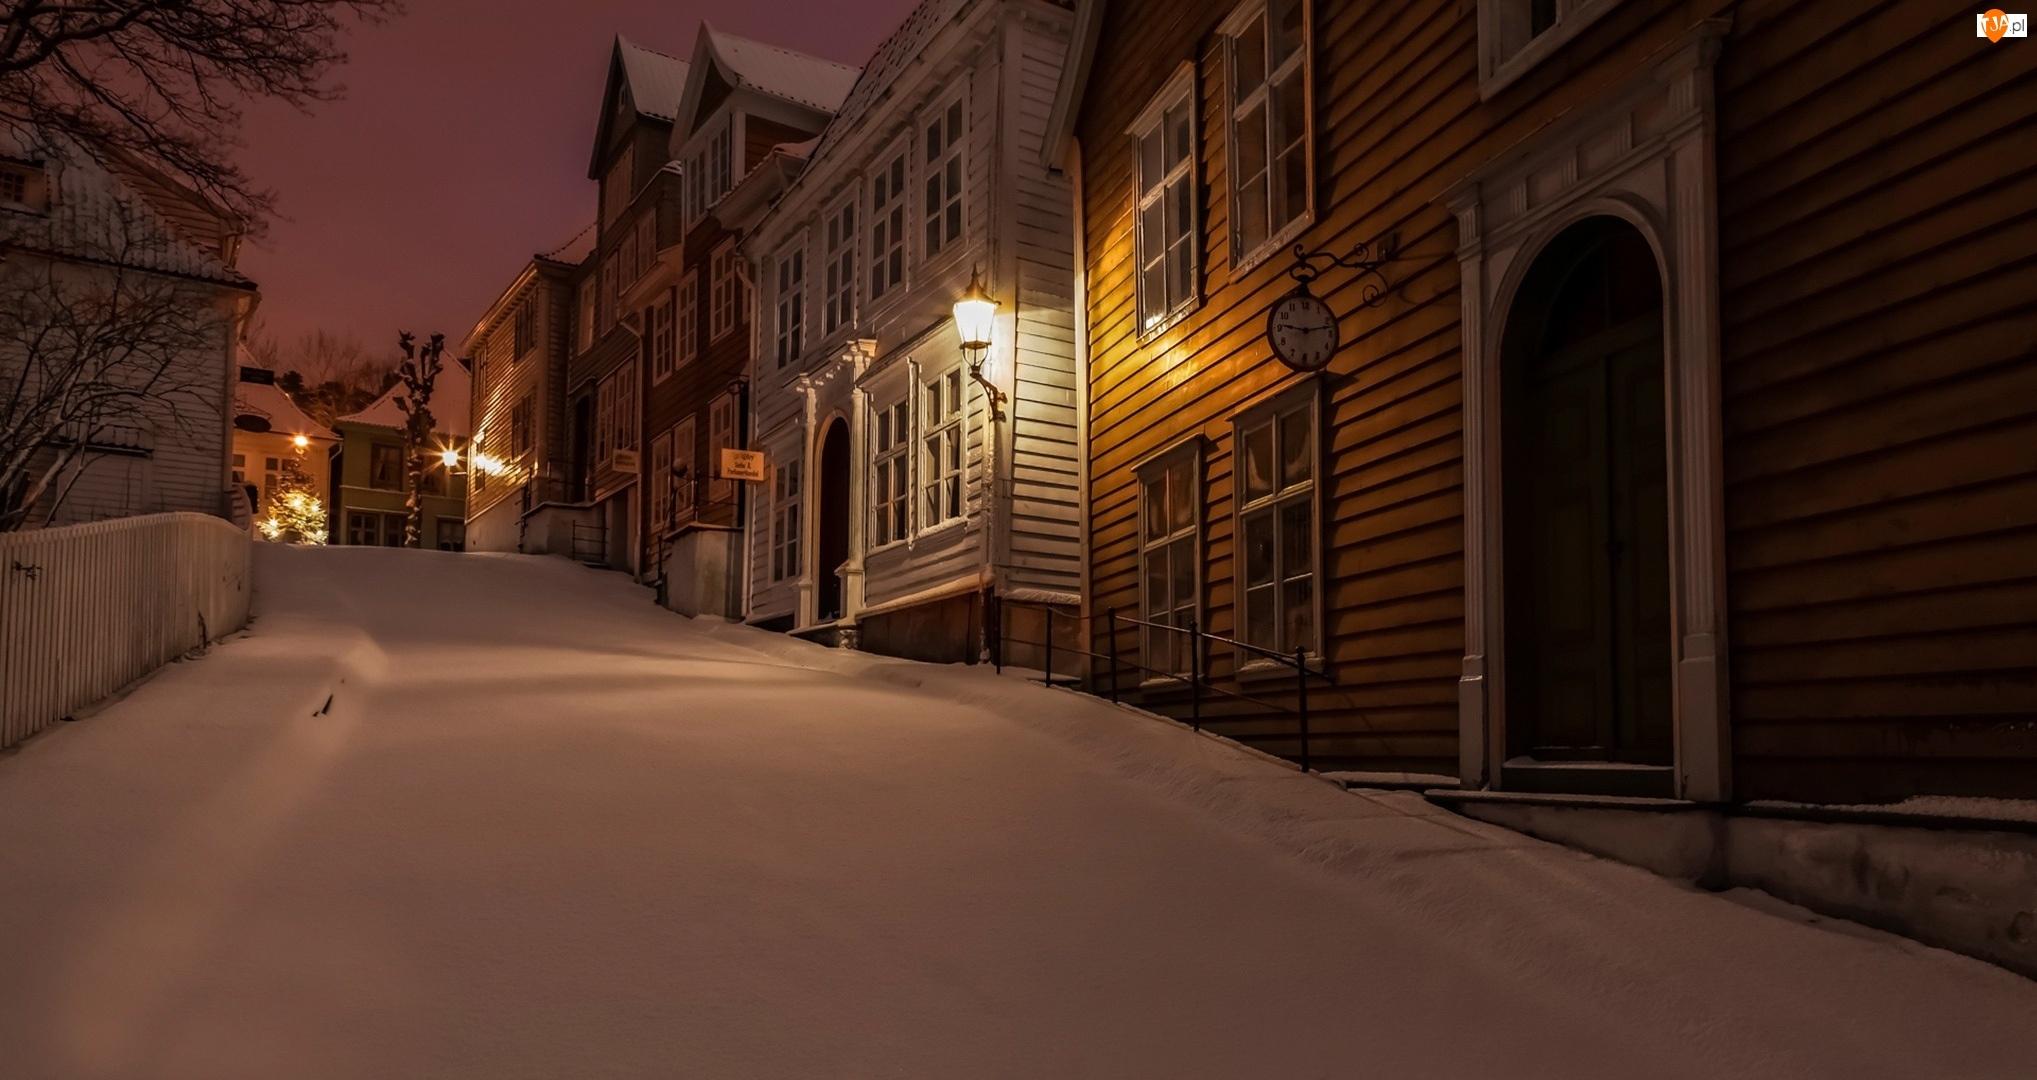 Domy, Norwegia, Ulica, Zima